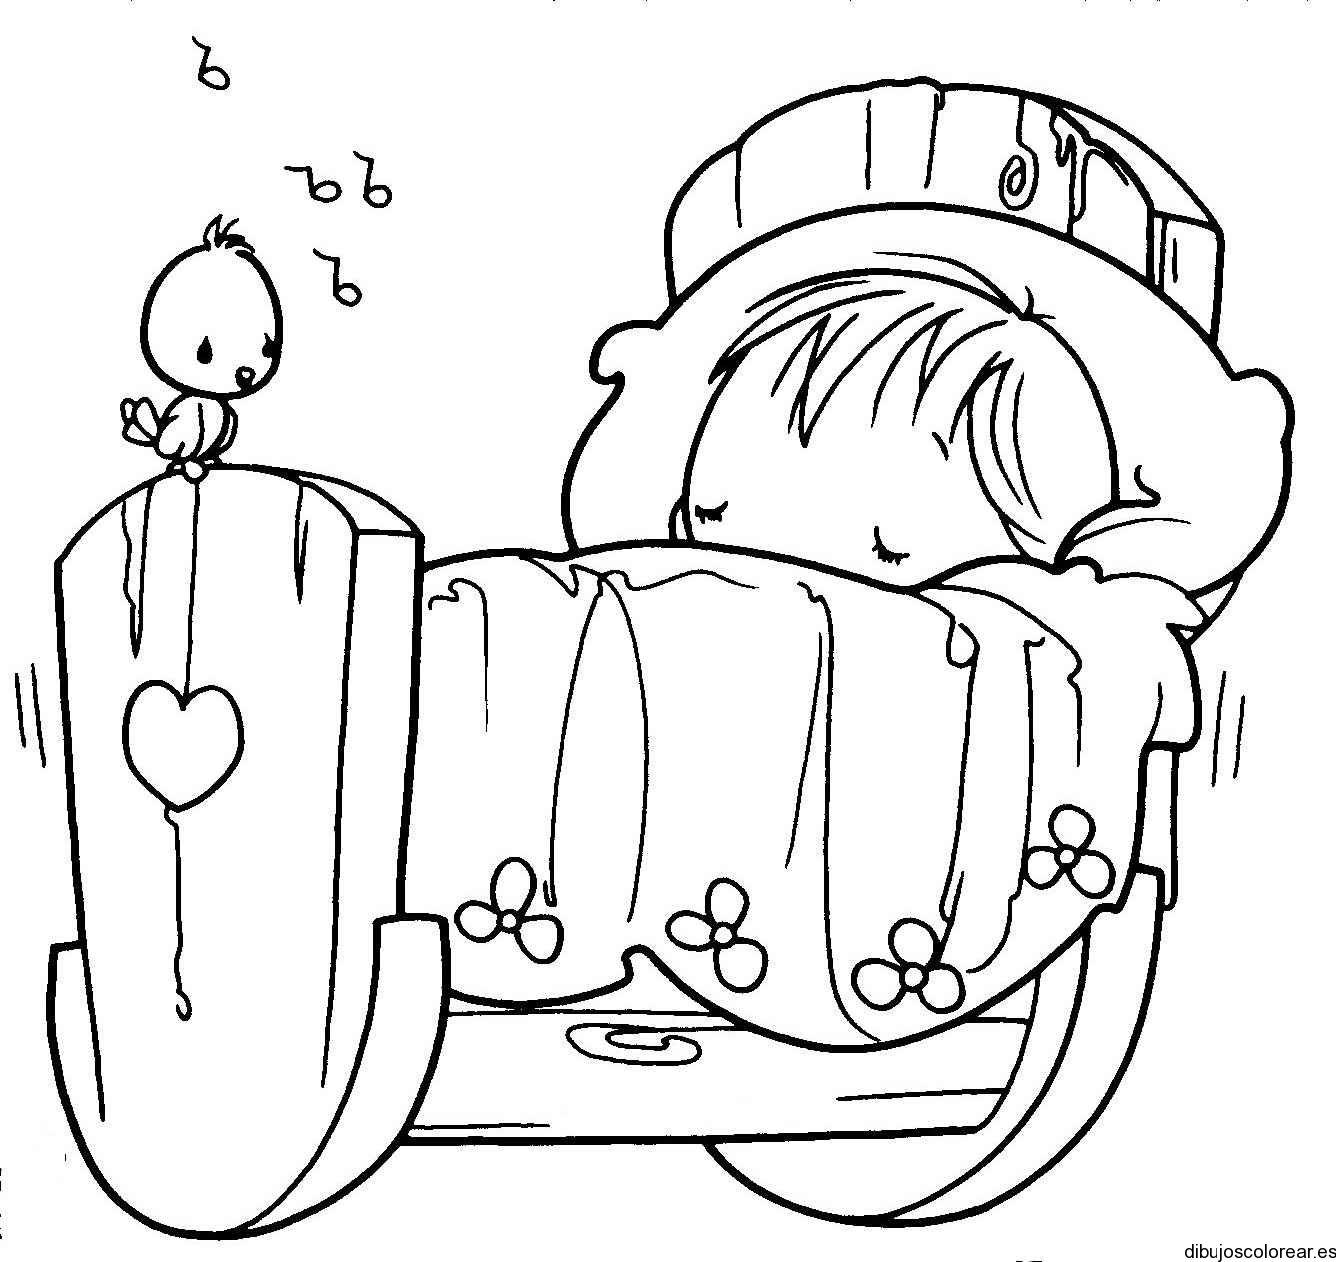 http://dibujoscolorear.es/wp-content/uploads/dibujos-para-colorear ...